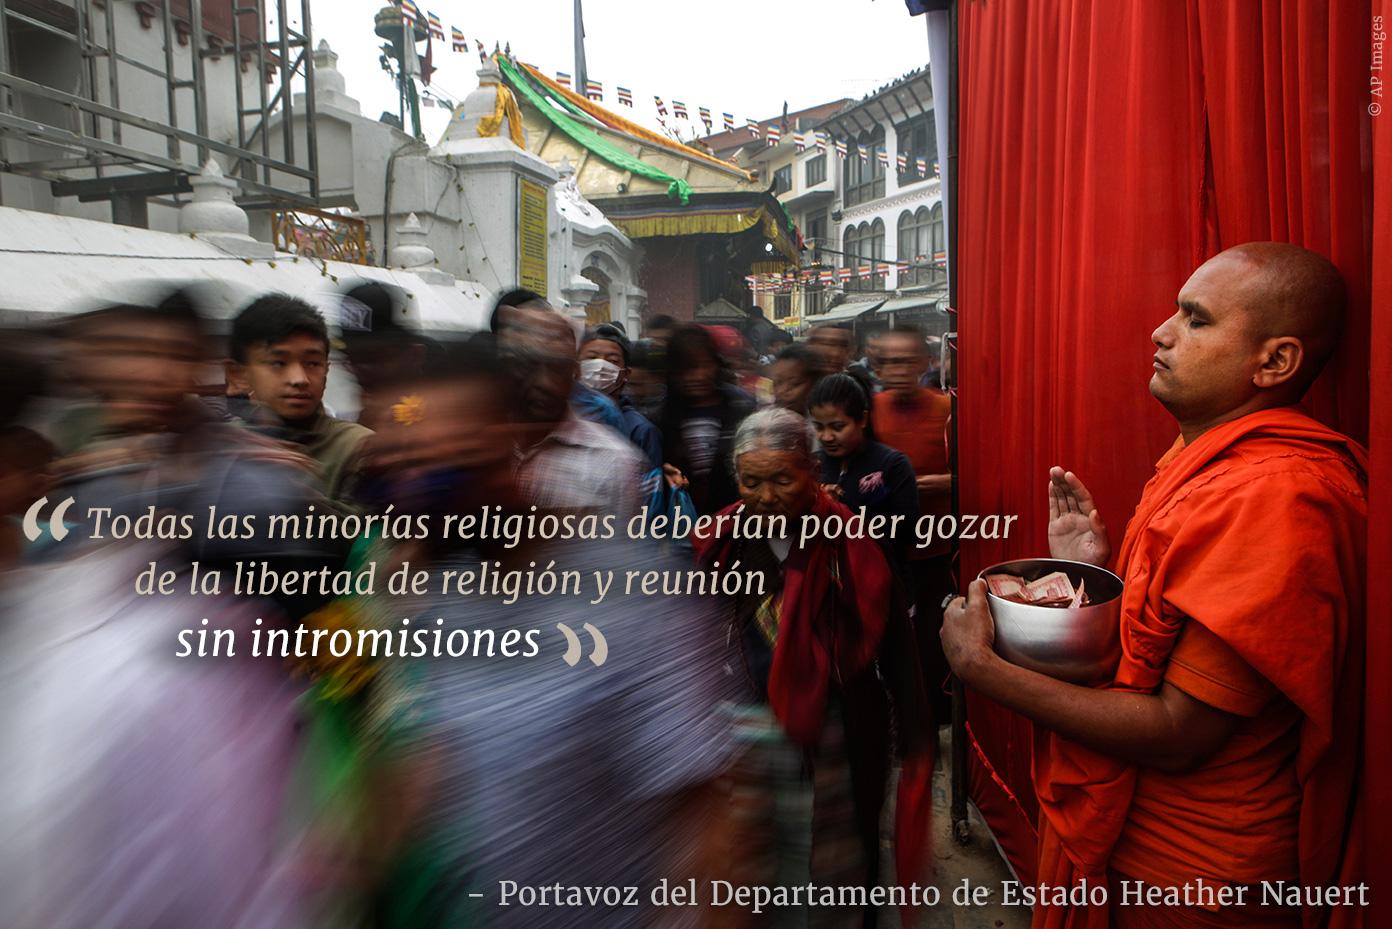 Monje budista pide a personas que pasan (© AP Images)